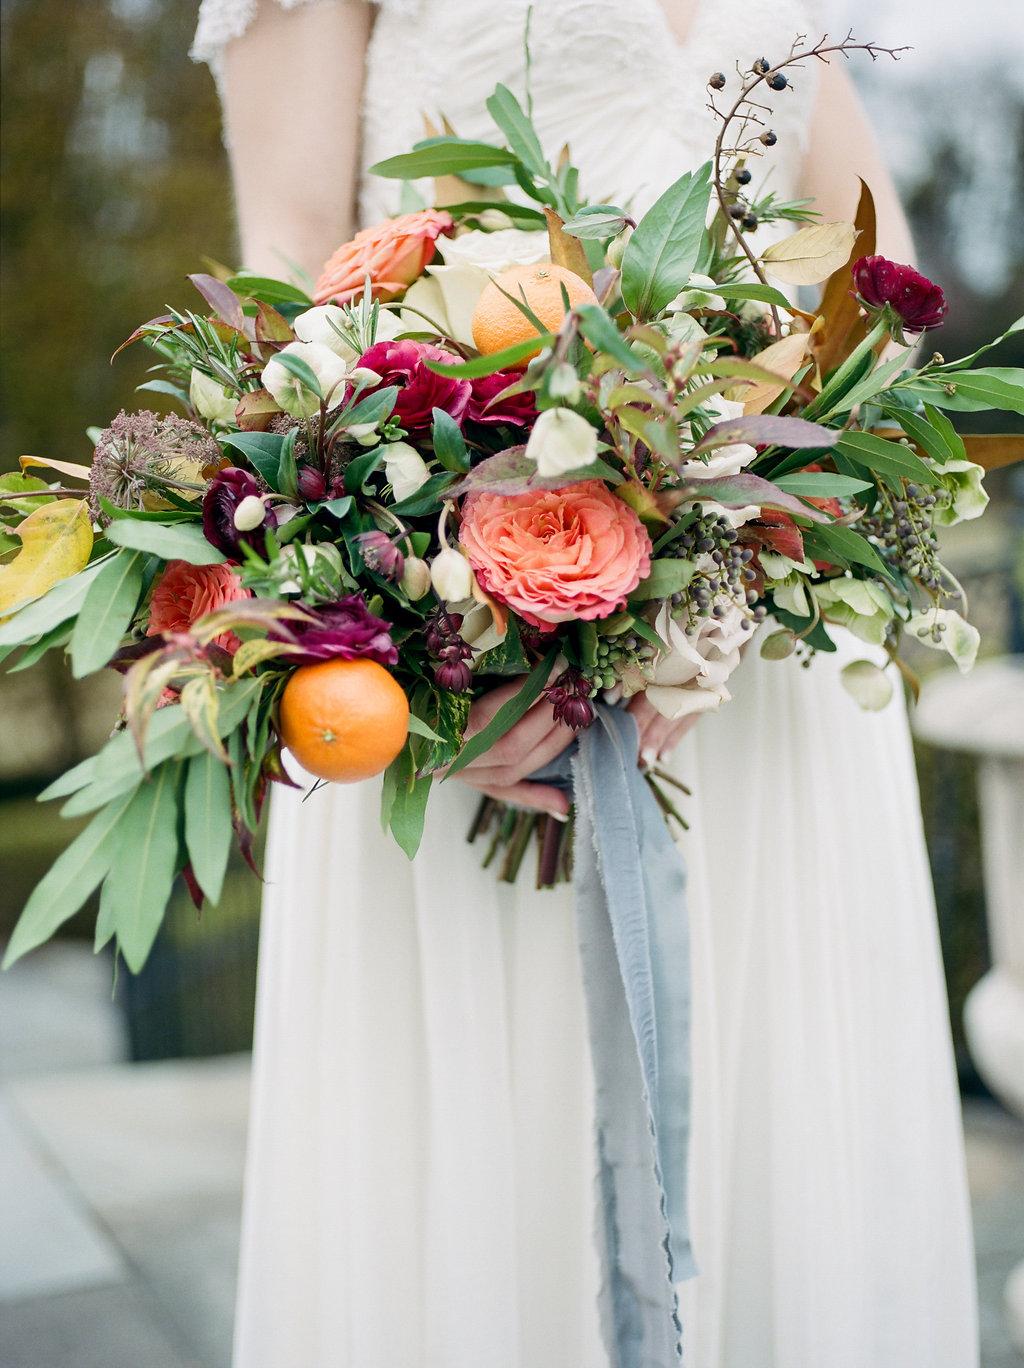 Romantic Fall Wedding Bouquets   Photo By Lissa Ryan Photography  Http://ruffledblog.